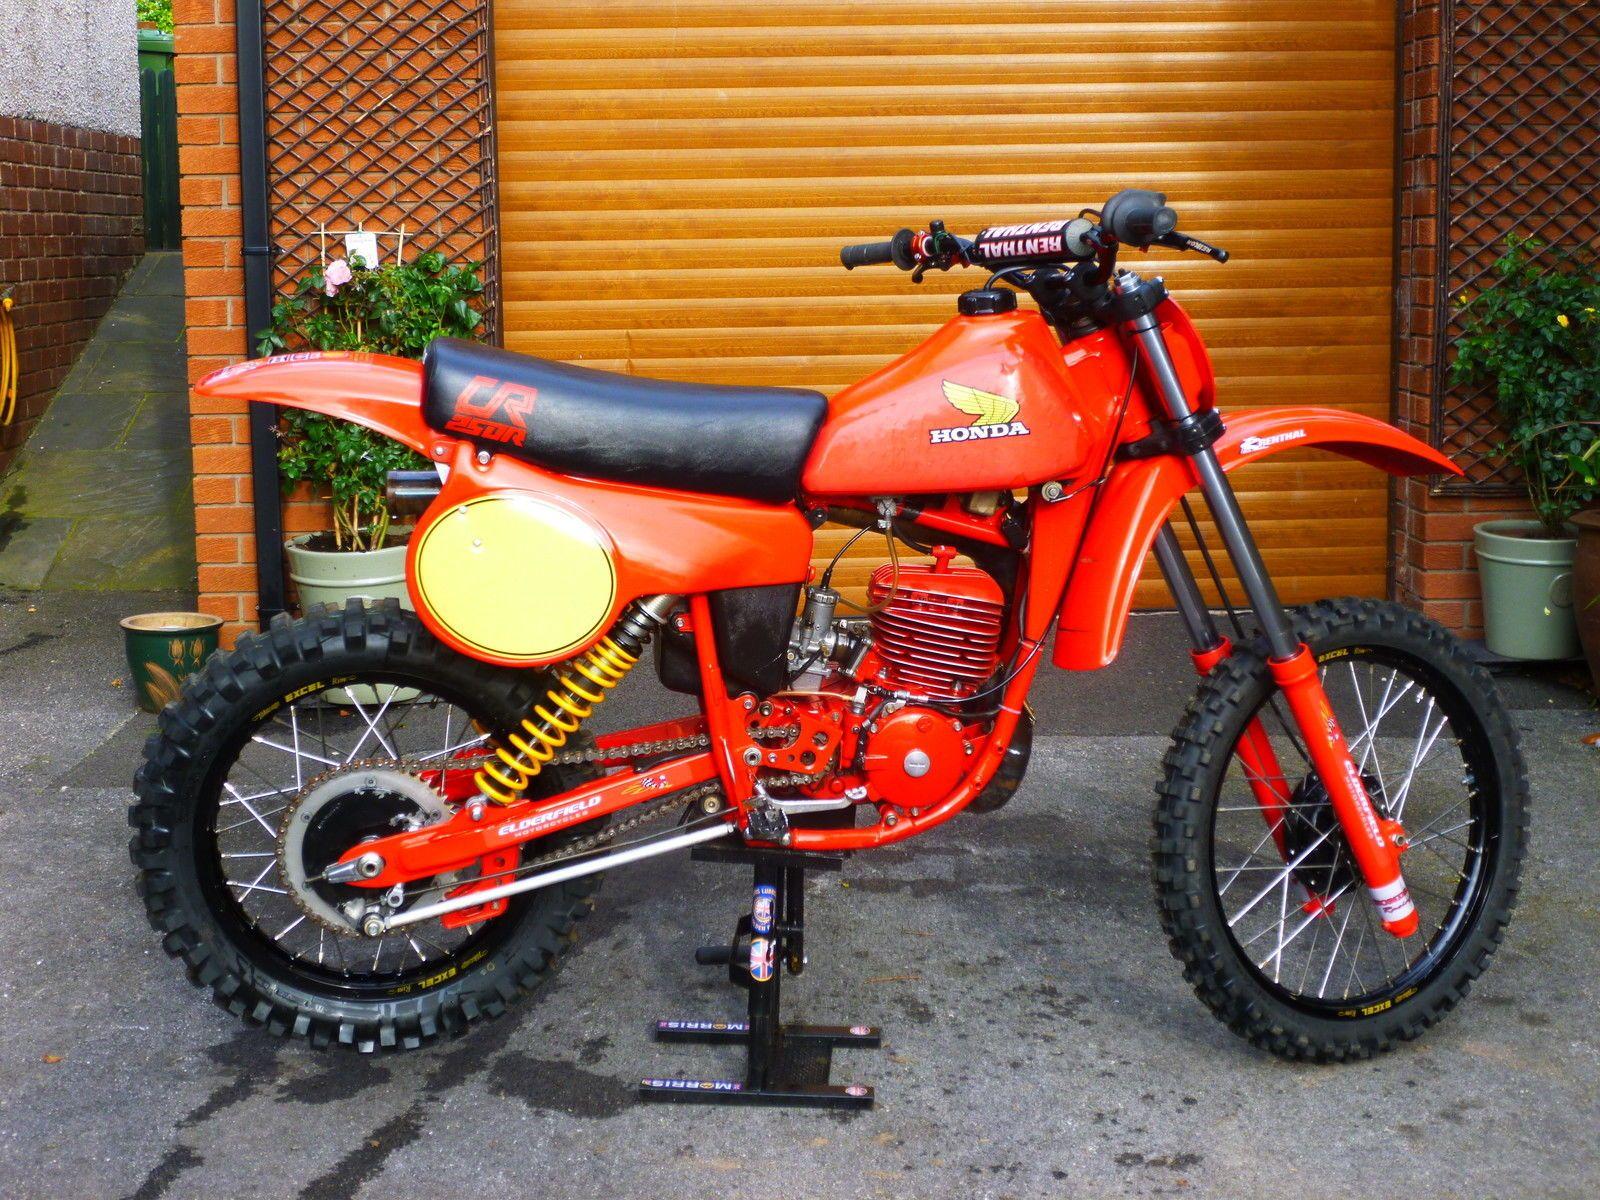 Honda 250cr 1980 motocross bike twinshock motocross honda and honda 250cr 1980 motocross bike twinshock ebay publicscrutiny Choice Image